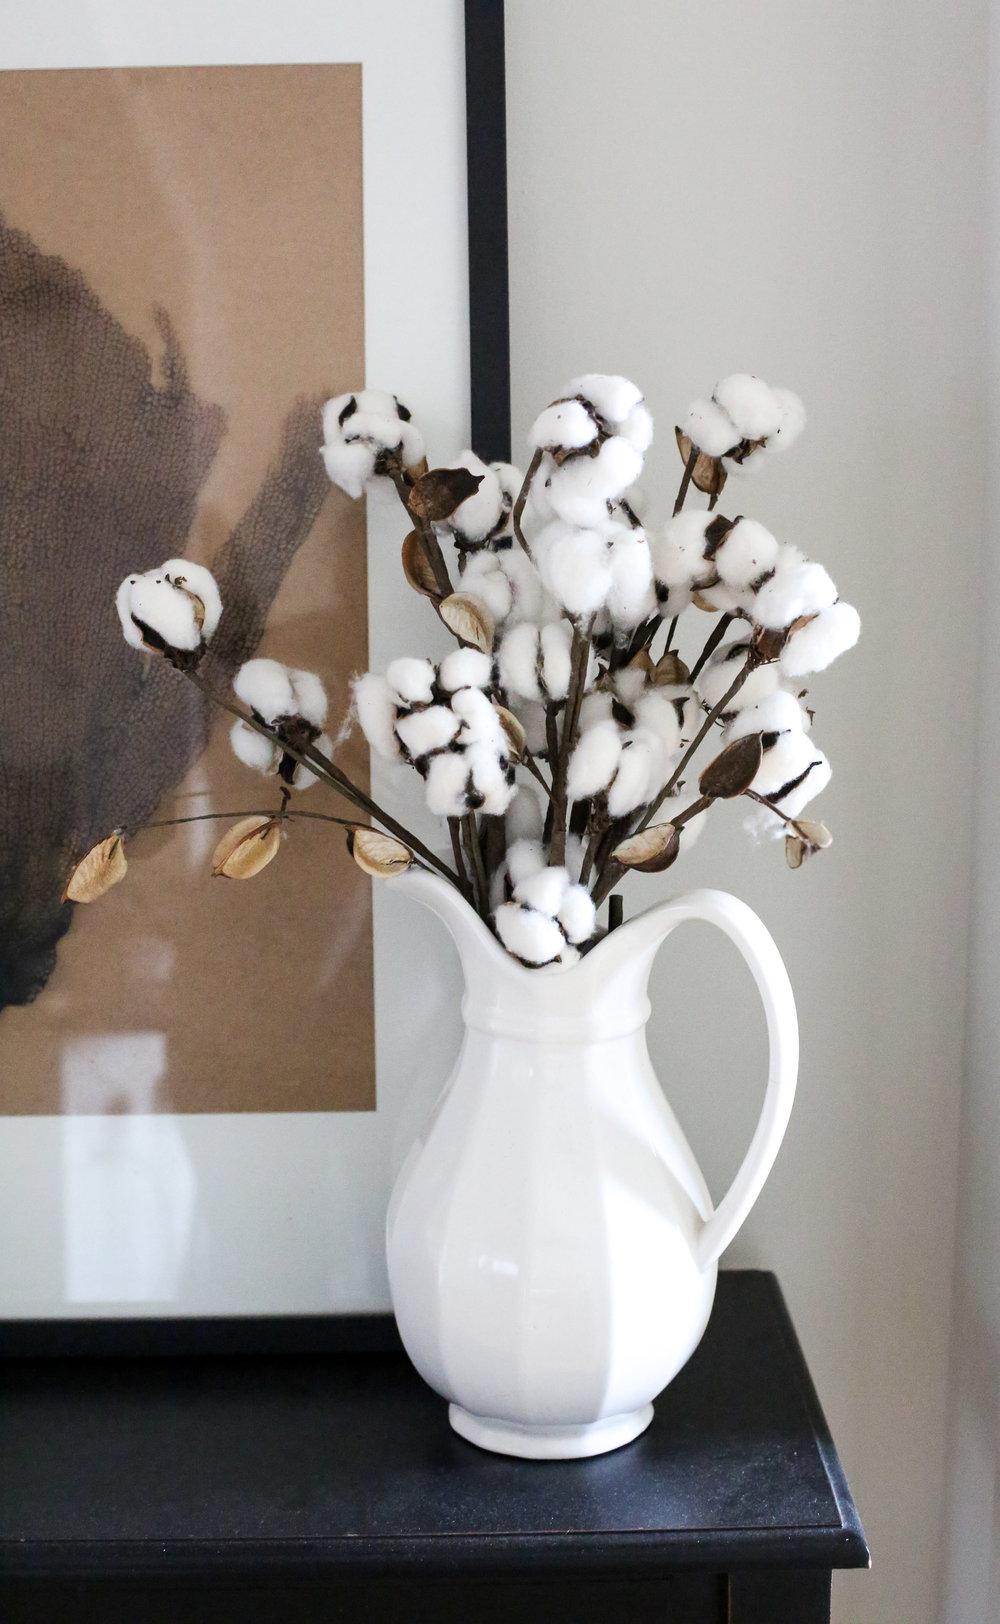 cooton-buds-displayed-as-flowers.jpg